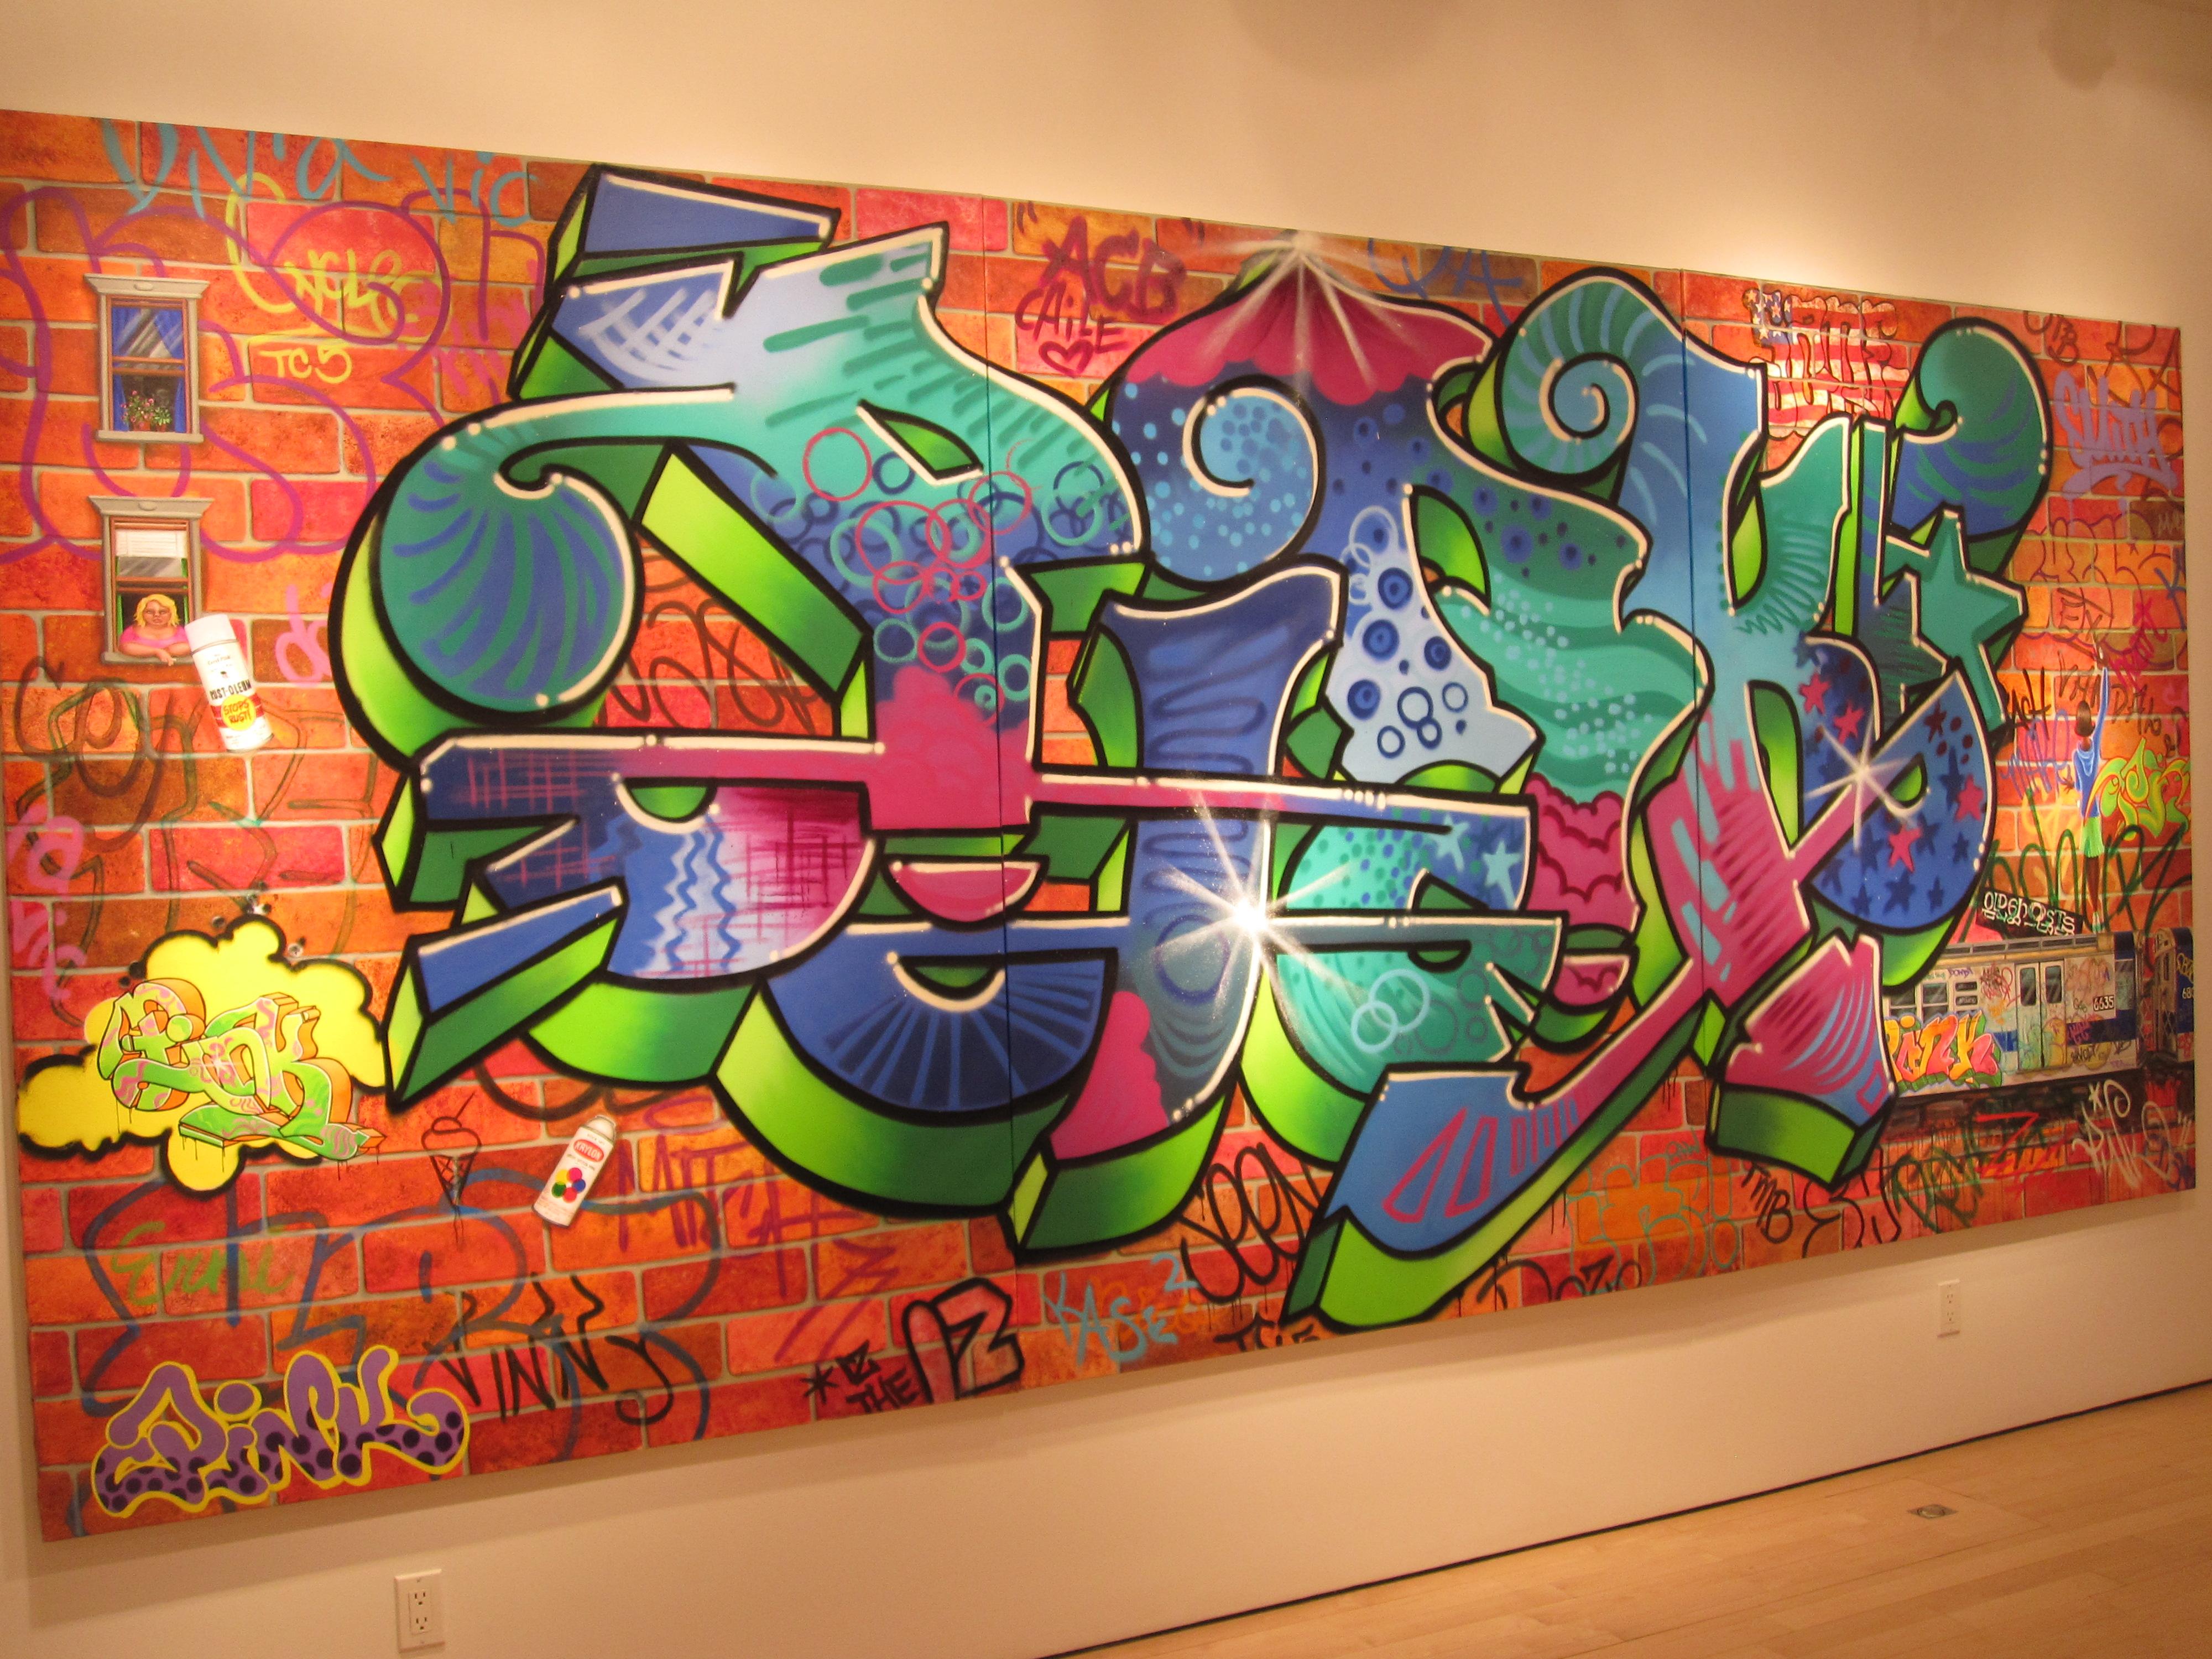 Famous Graffiti Artworks - 21 amazing examples of graffiti